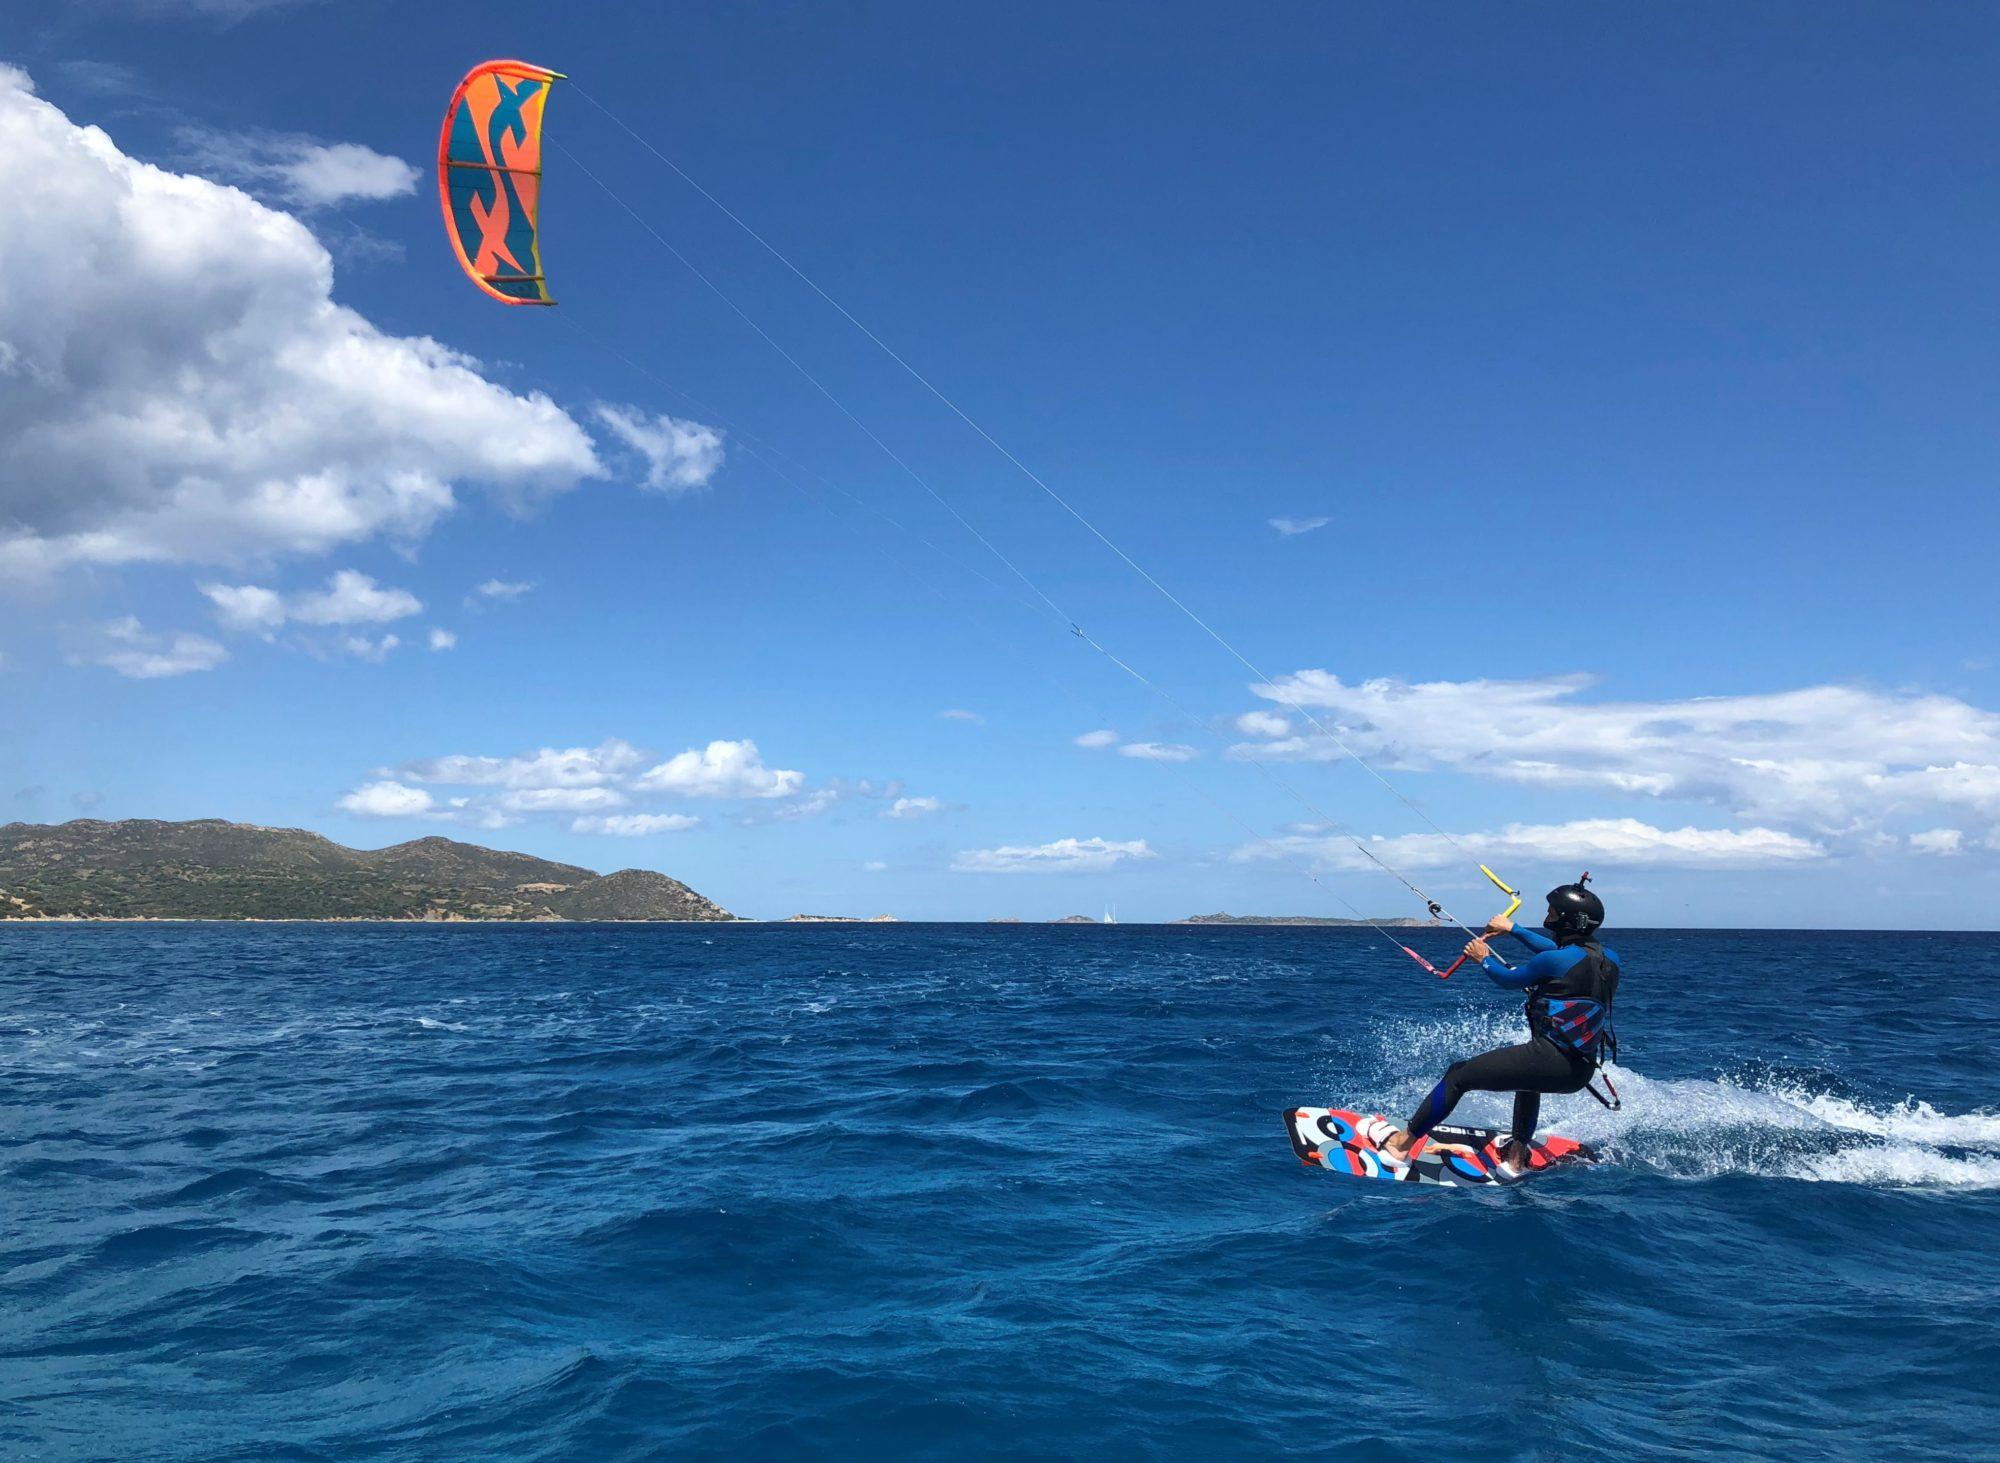 Kite Course in Villasimius, Sardinia